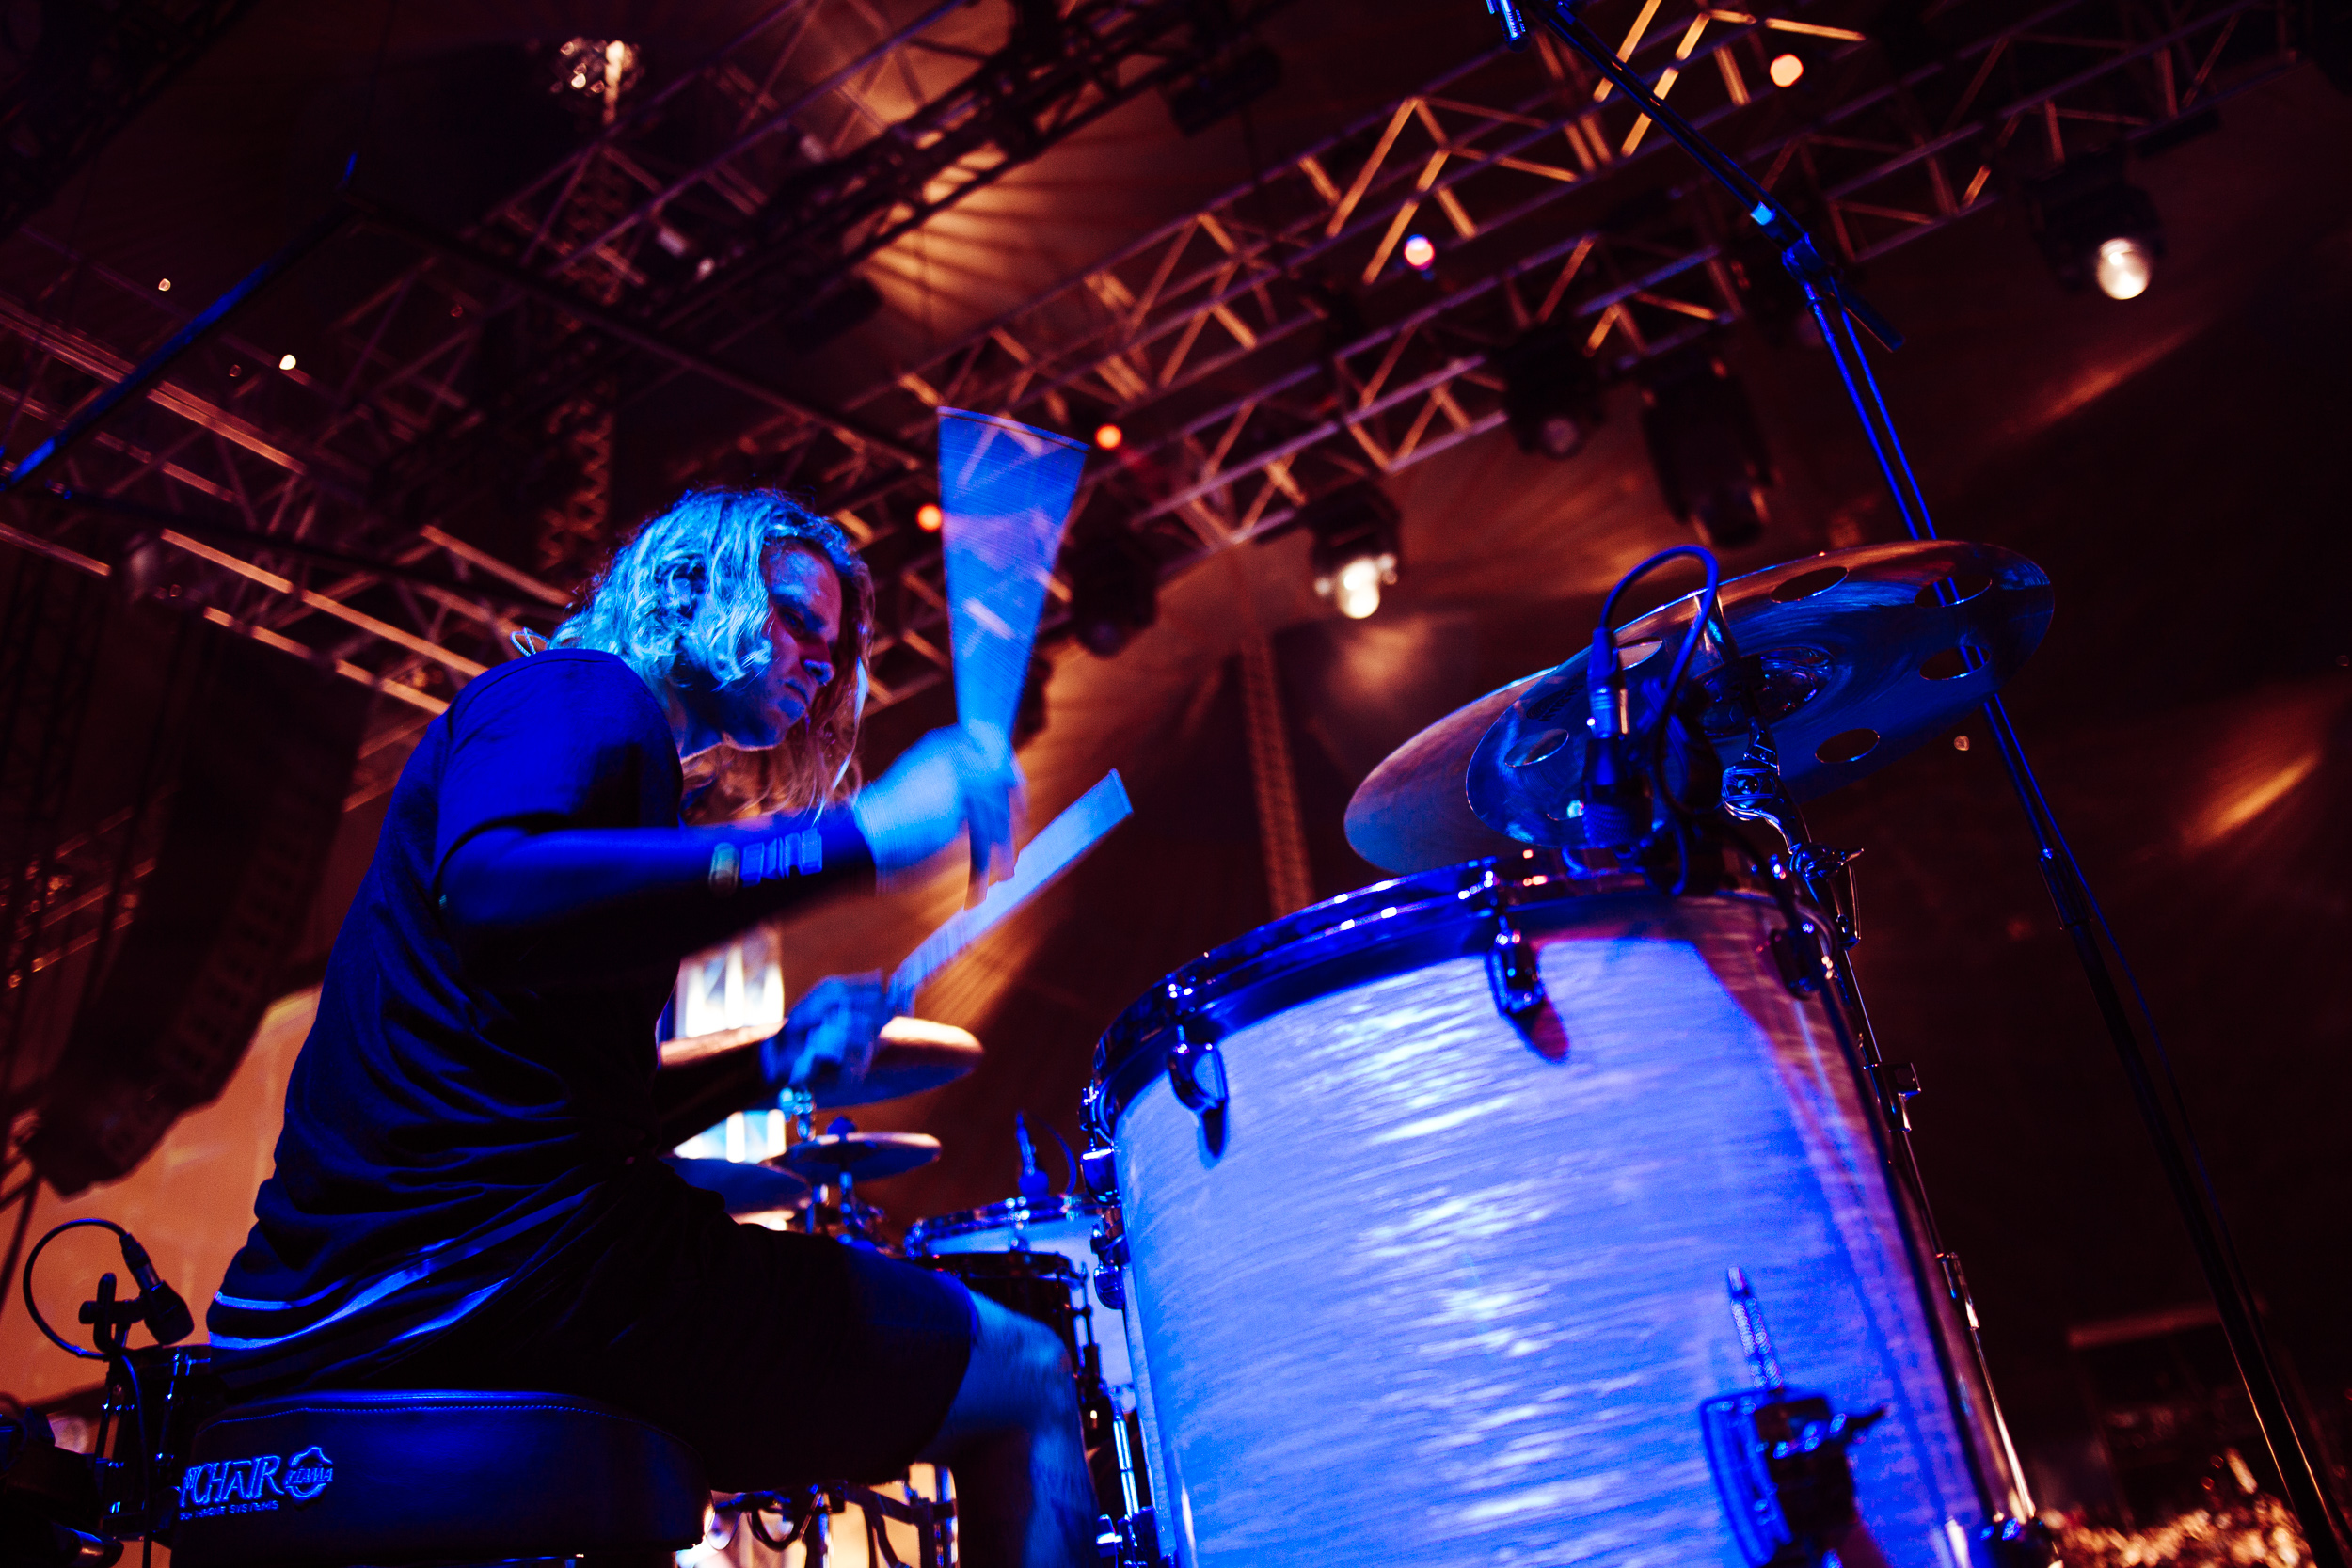 Matt Best of Tonight Alive at Leeds Festival by Adam Elmakias